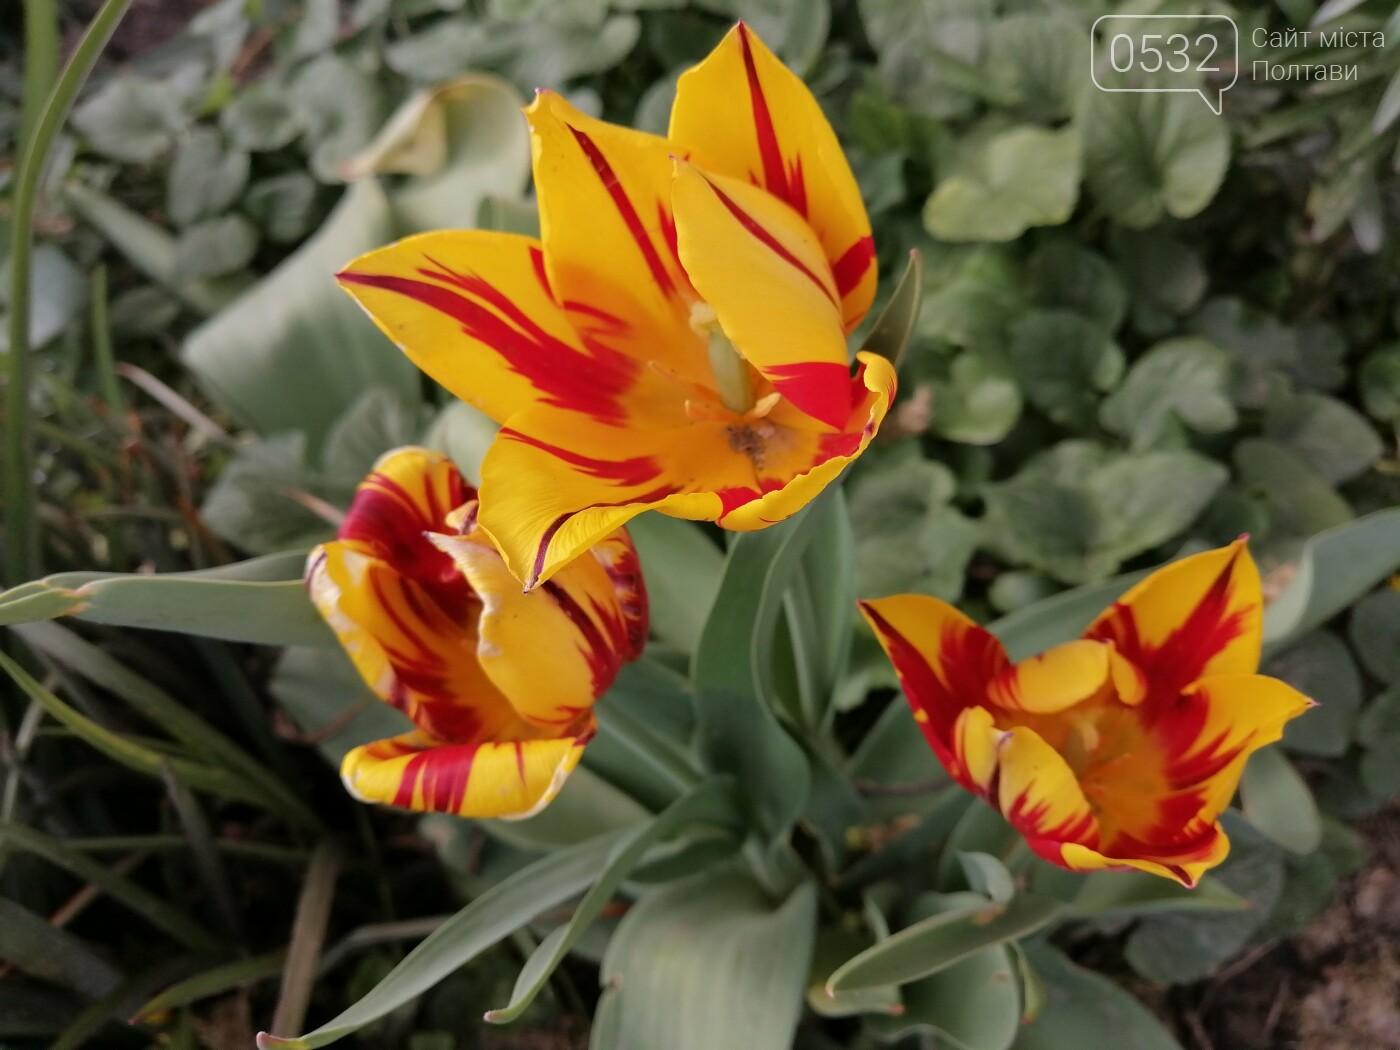 Весняна Полтава (ФОТОРЕПОРТАЖ), фото-6